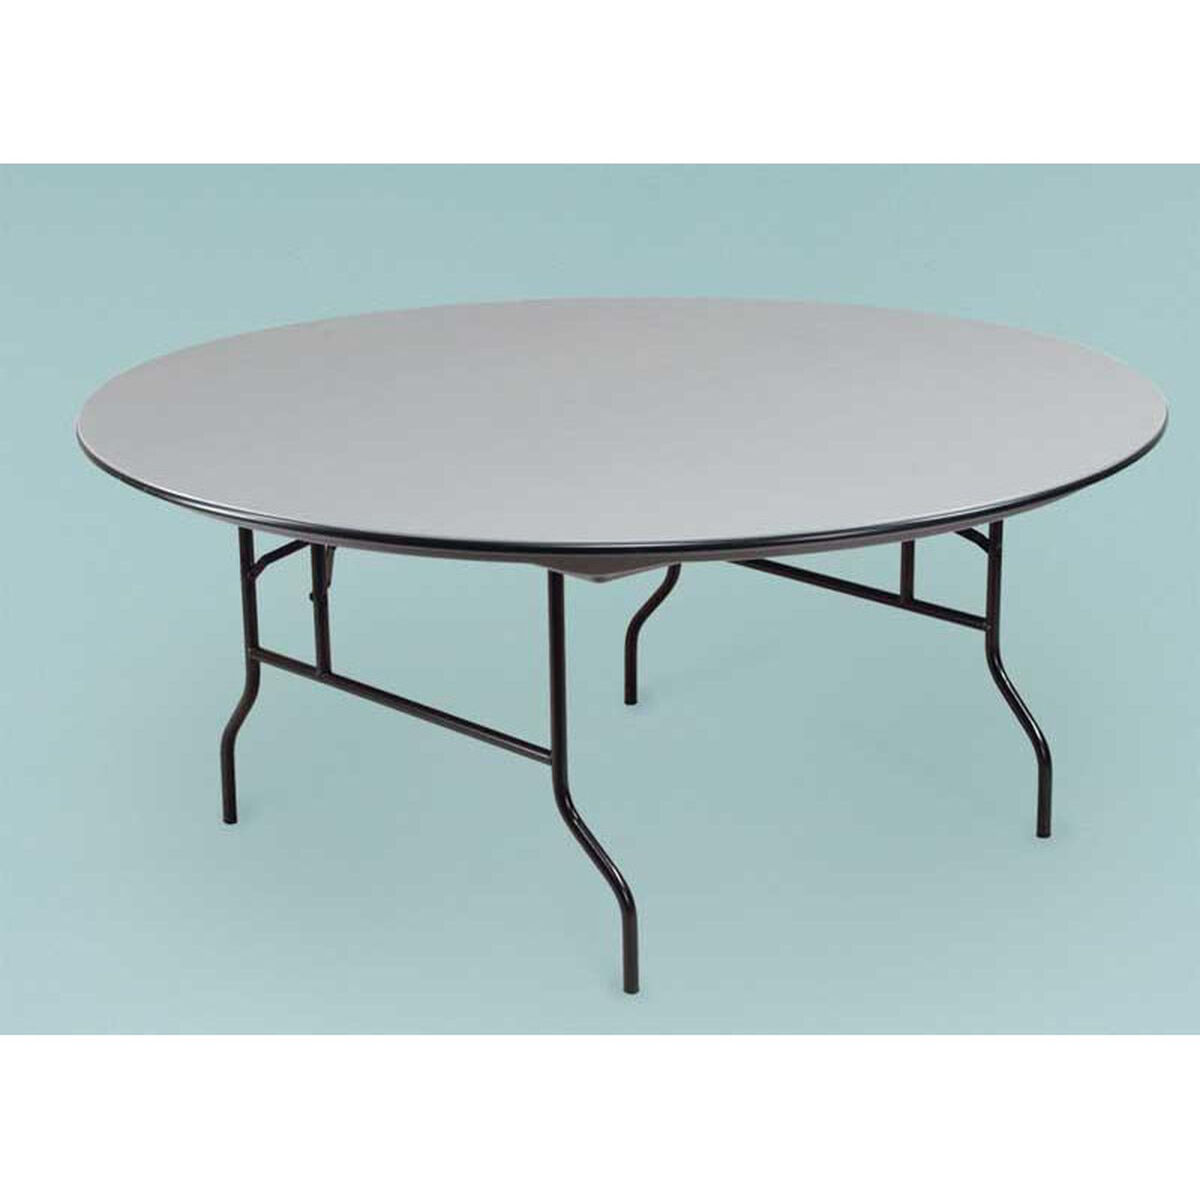 NLW Round Plastic Folding Table R72NLW | BestChiavariChairs.com